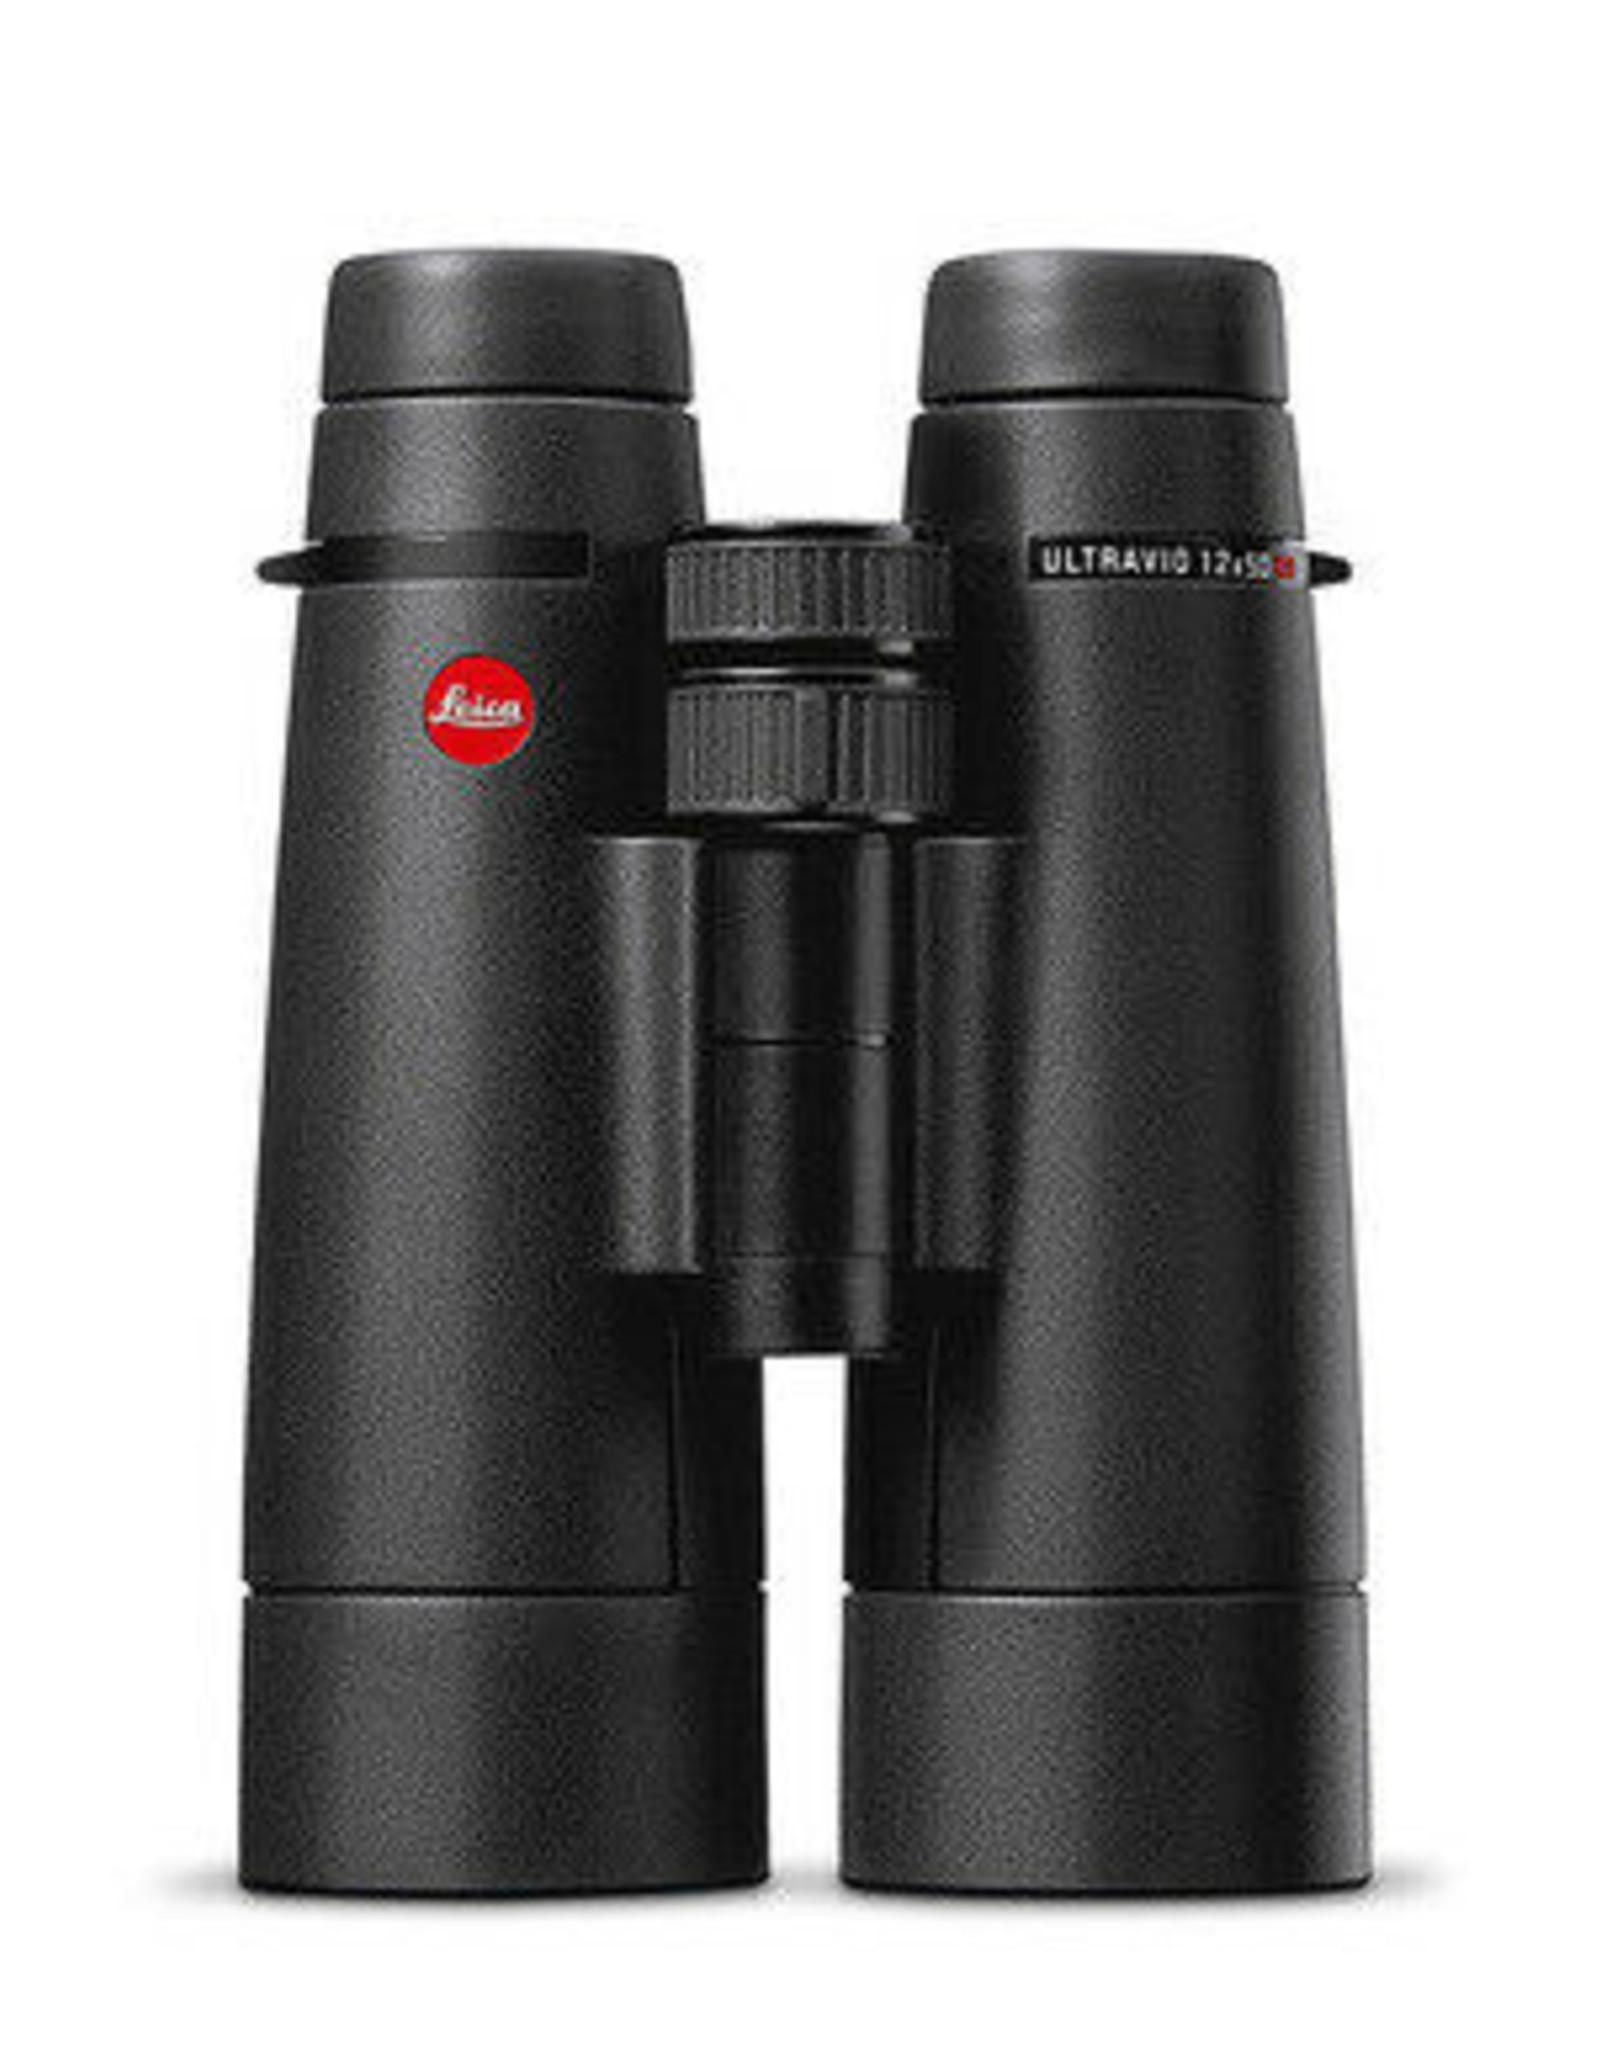 Leica Ultravid 12x50 HD